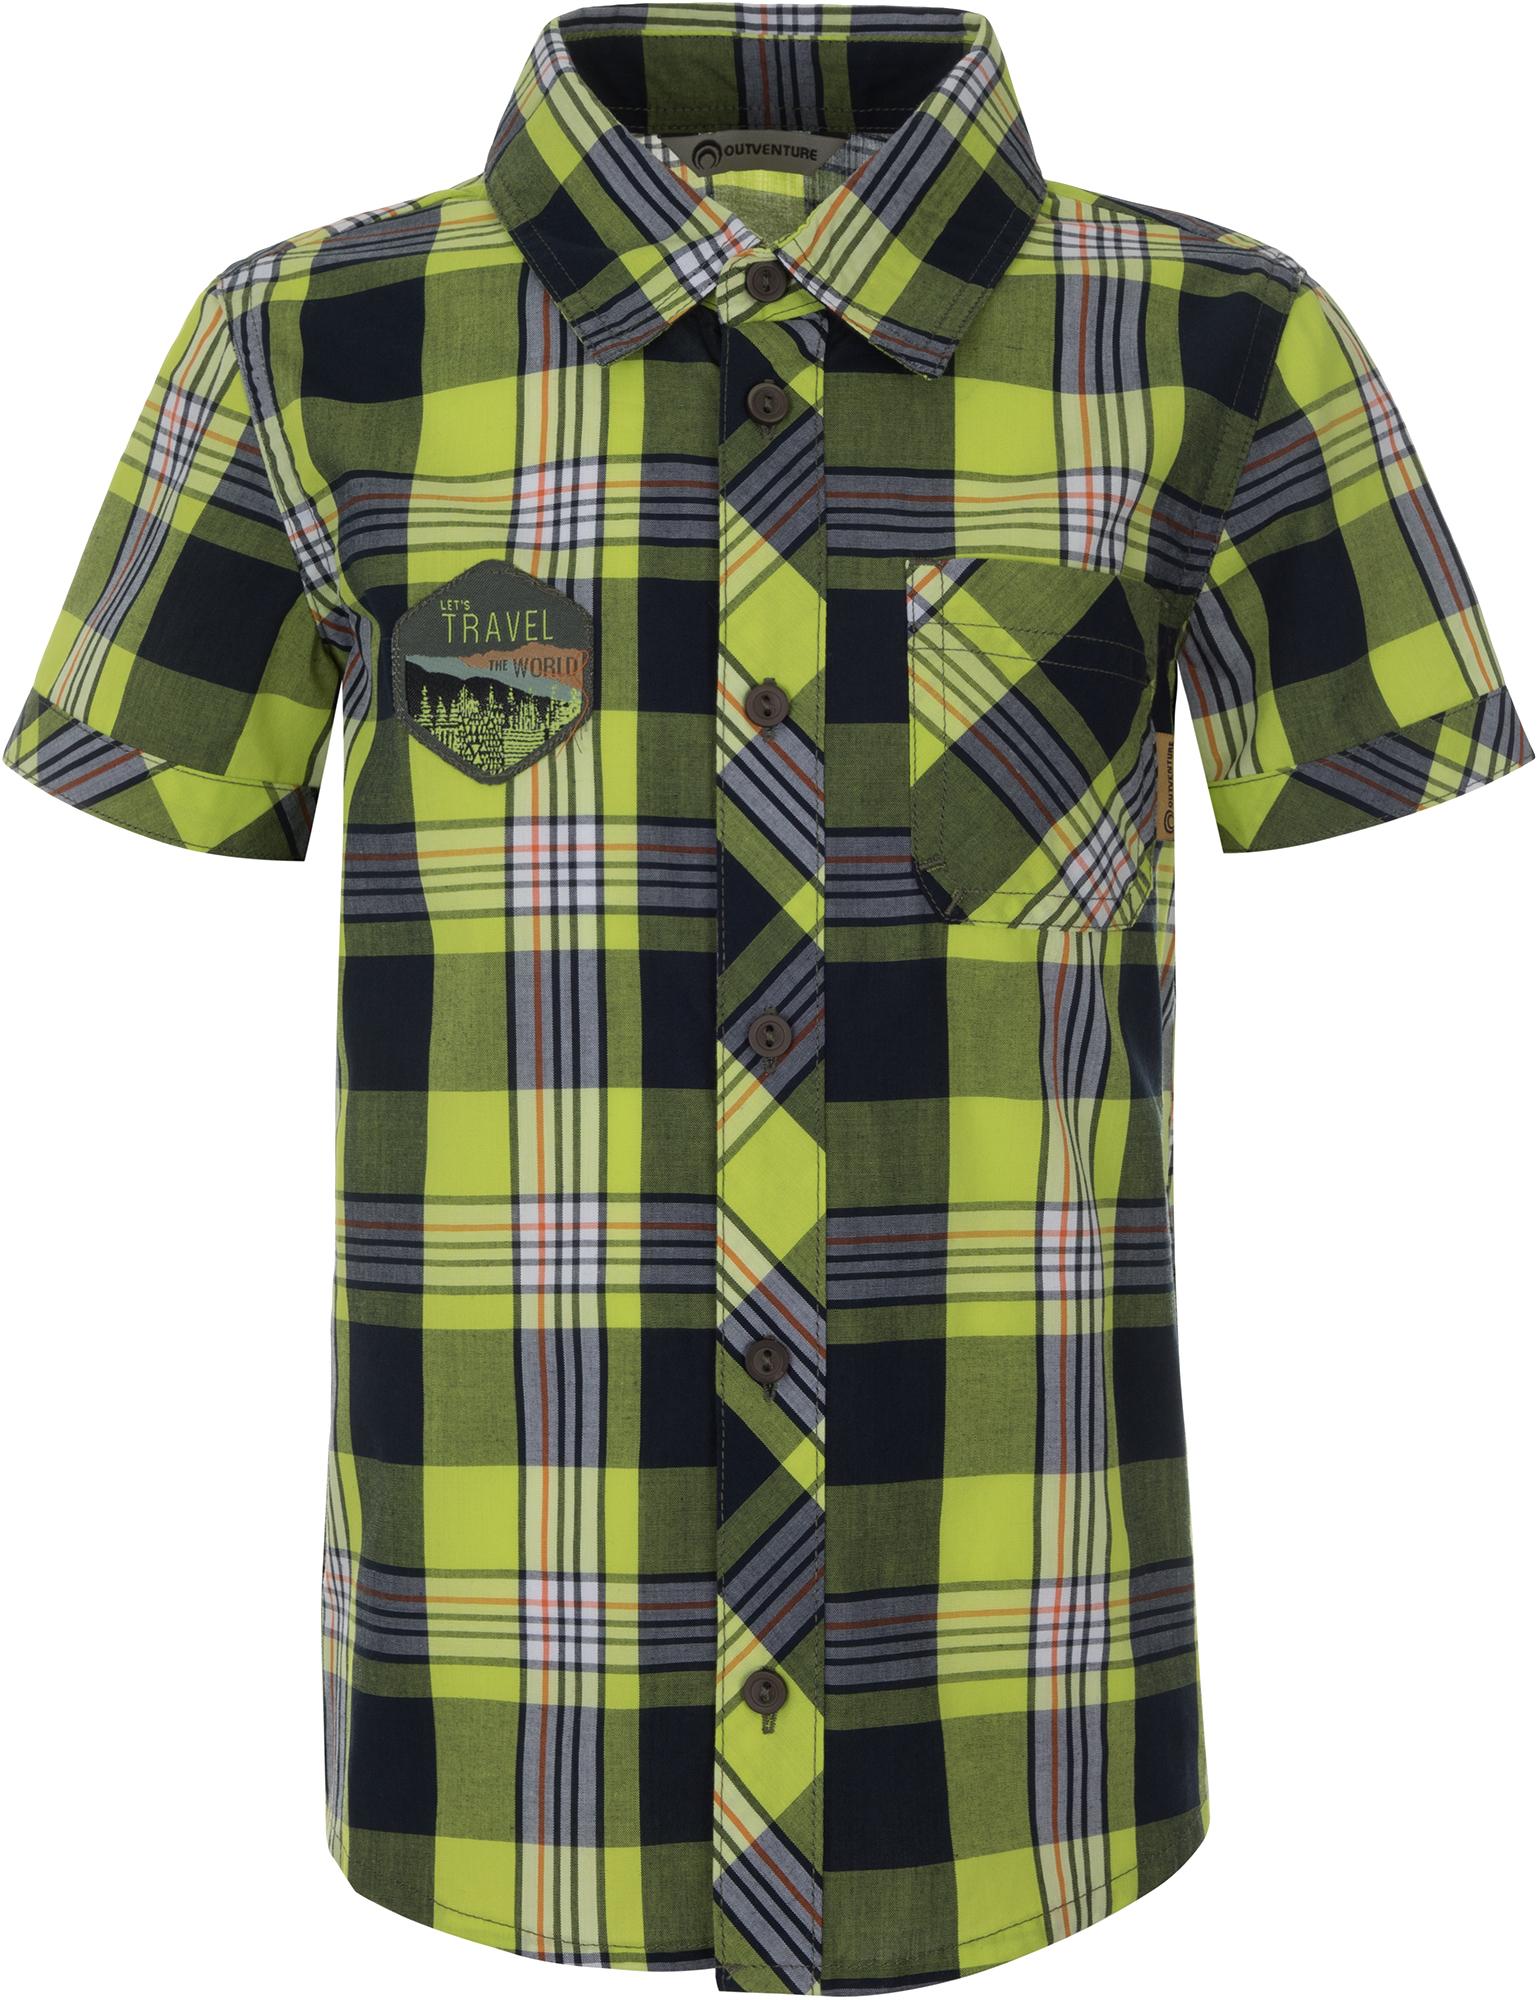 Outventure Рубашка с коротким рукавом для мальчиков Outventure, размер 122